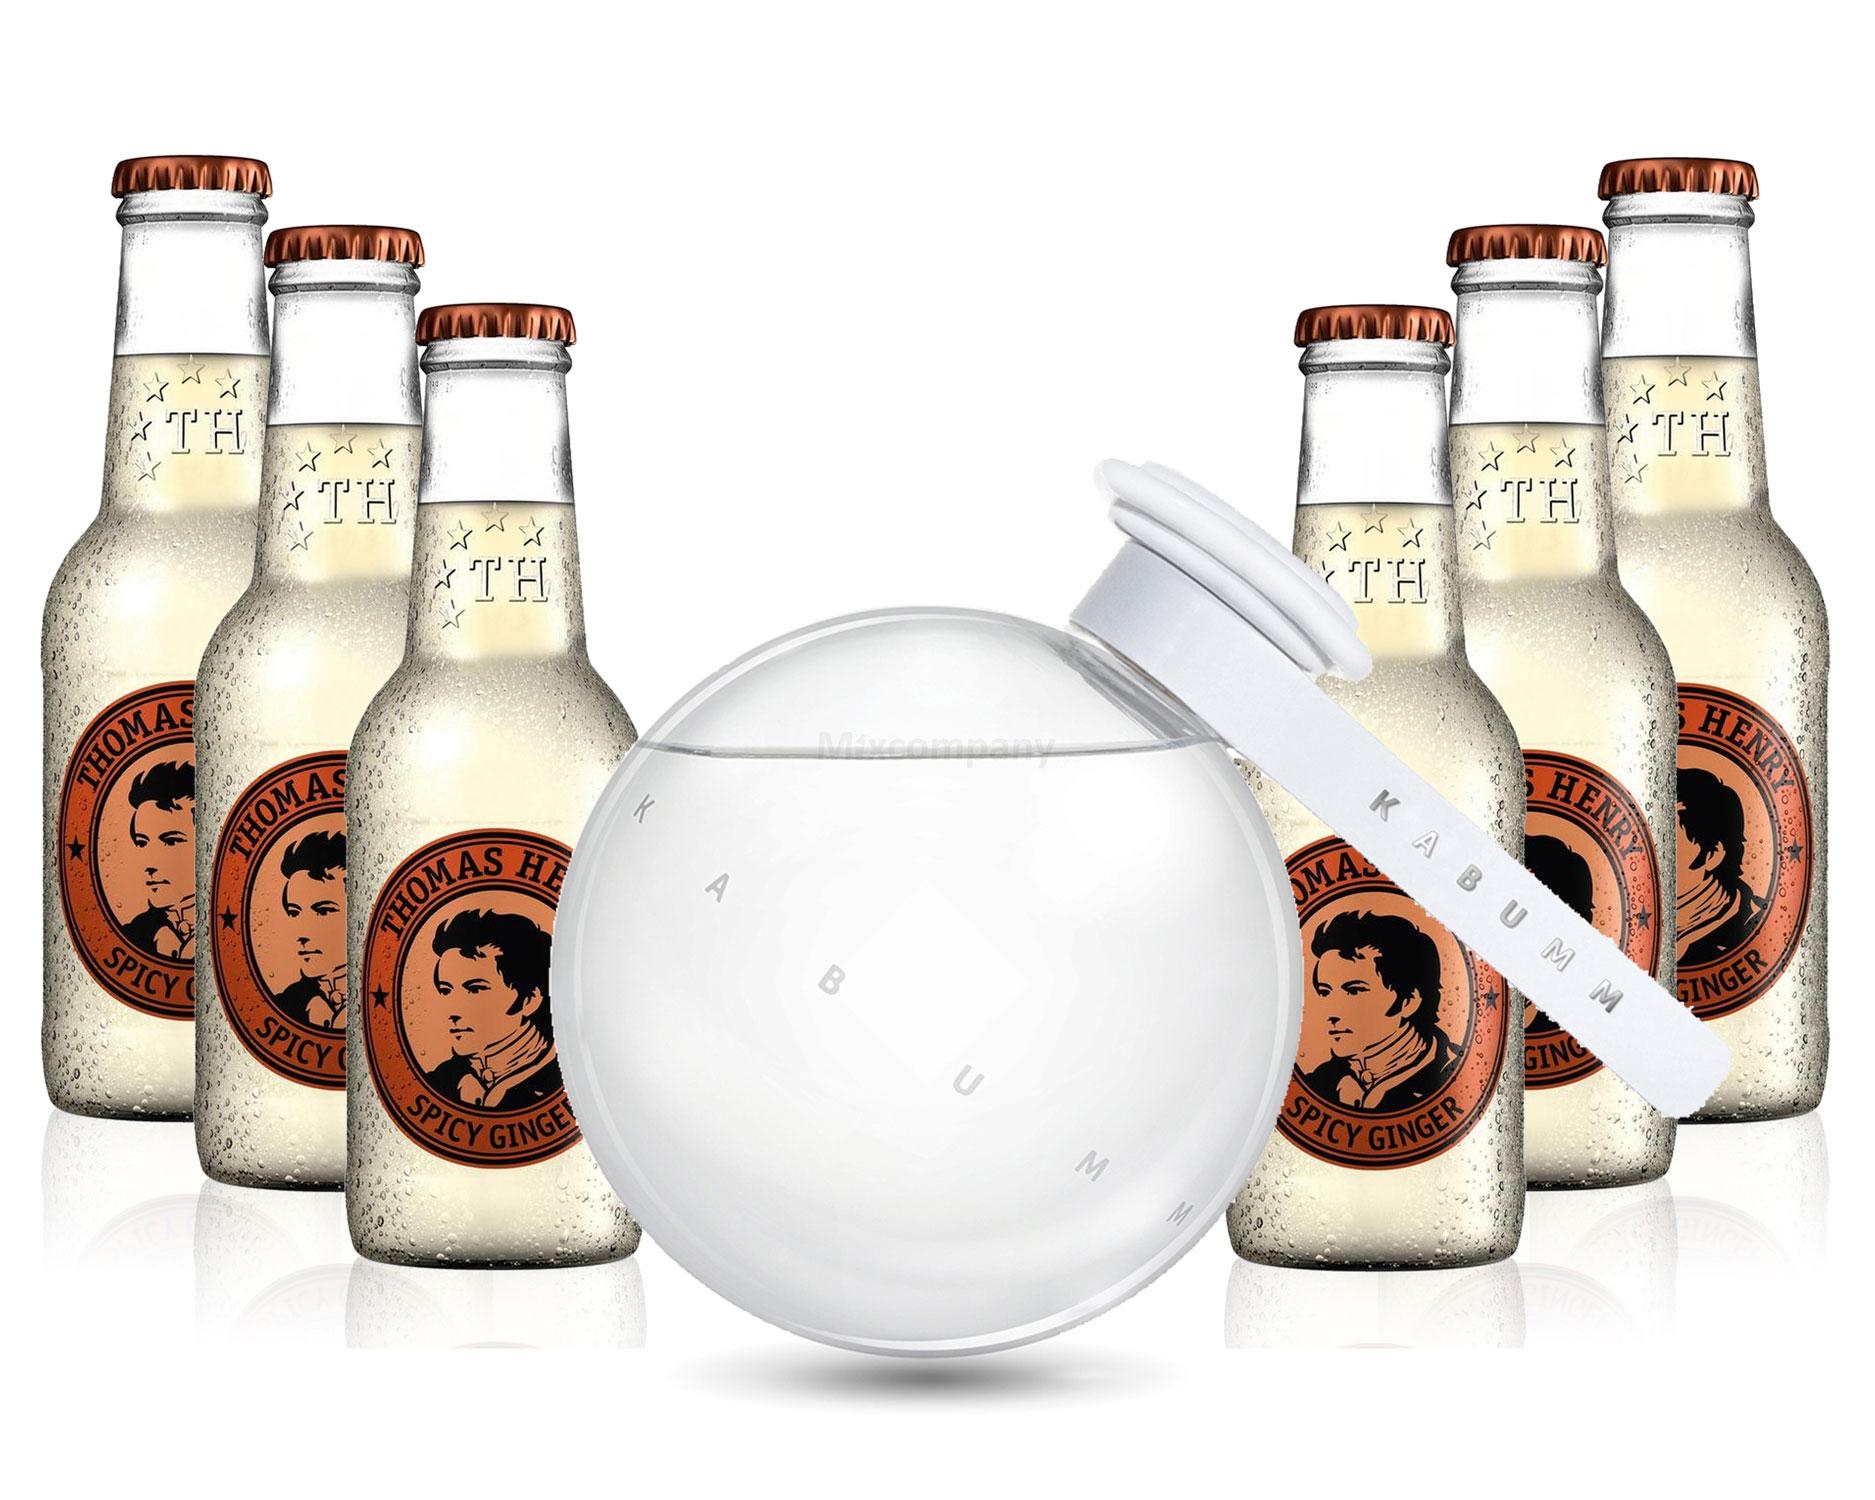 Moscow Mule Set - Kabumm Vodka 0,7l 700ml (40% Vol) + 6x Thomas Henry Spicy Ginger 200ml - Inkl. Pfand MEHRWEG